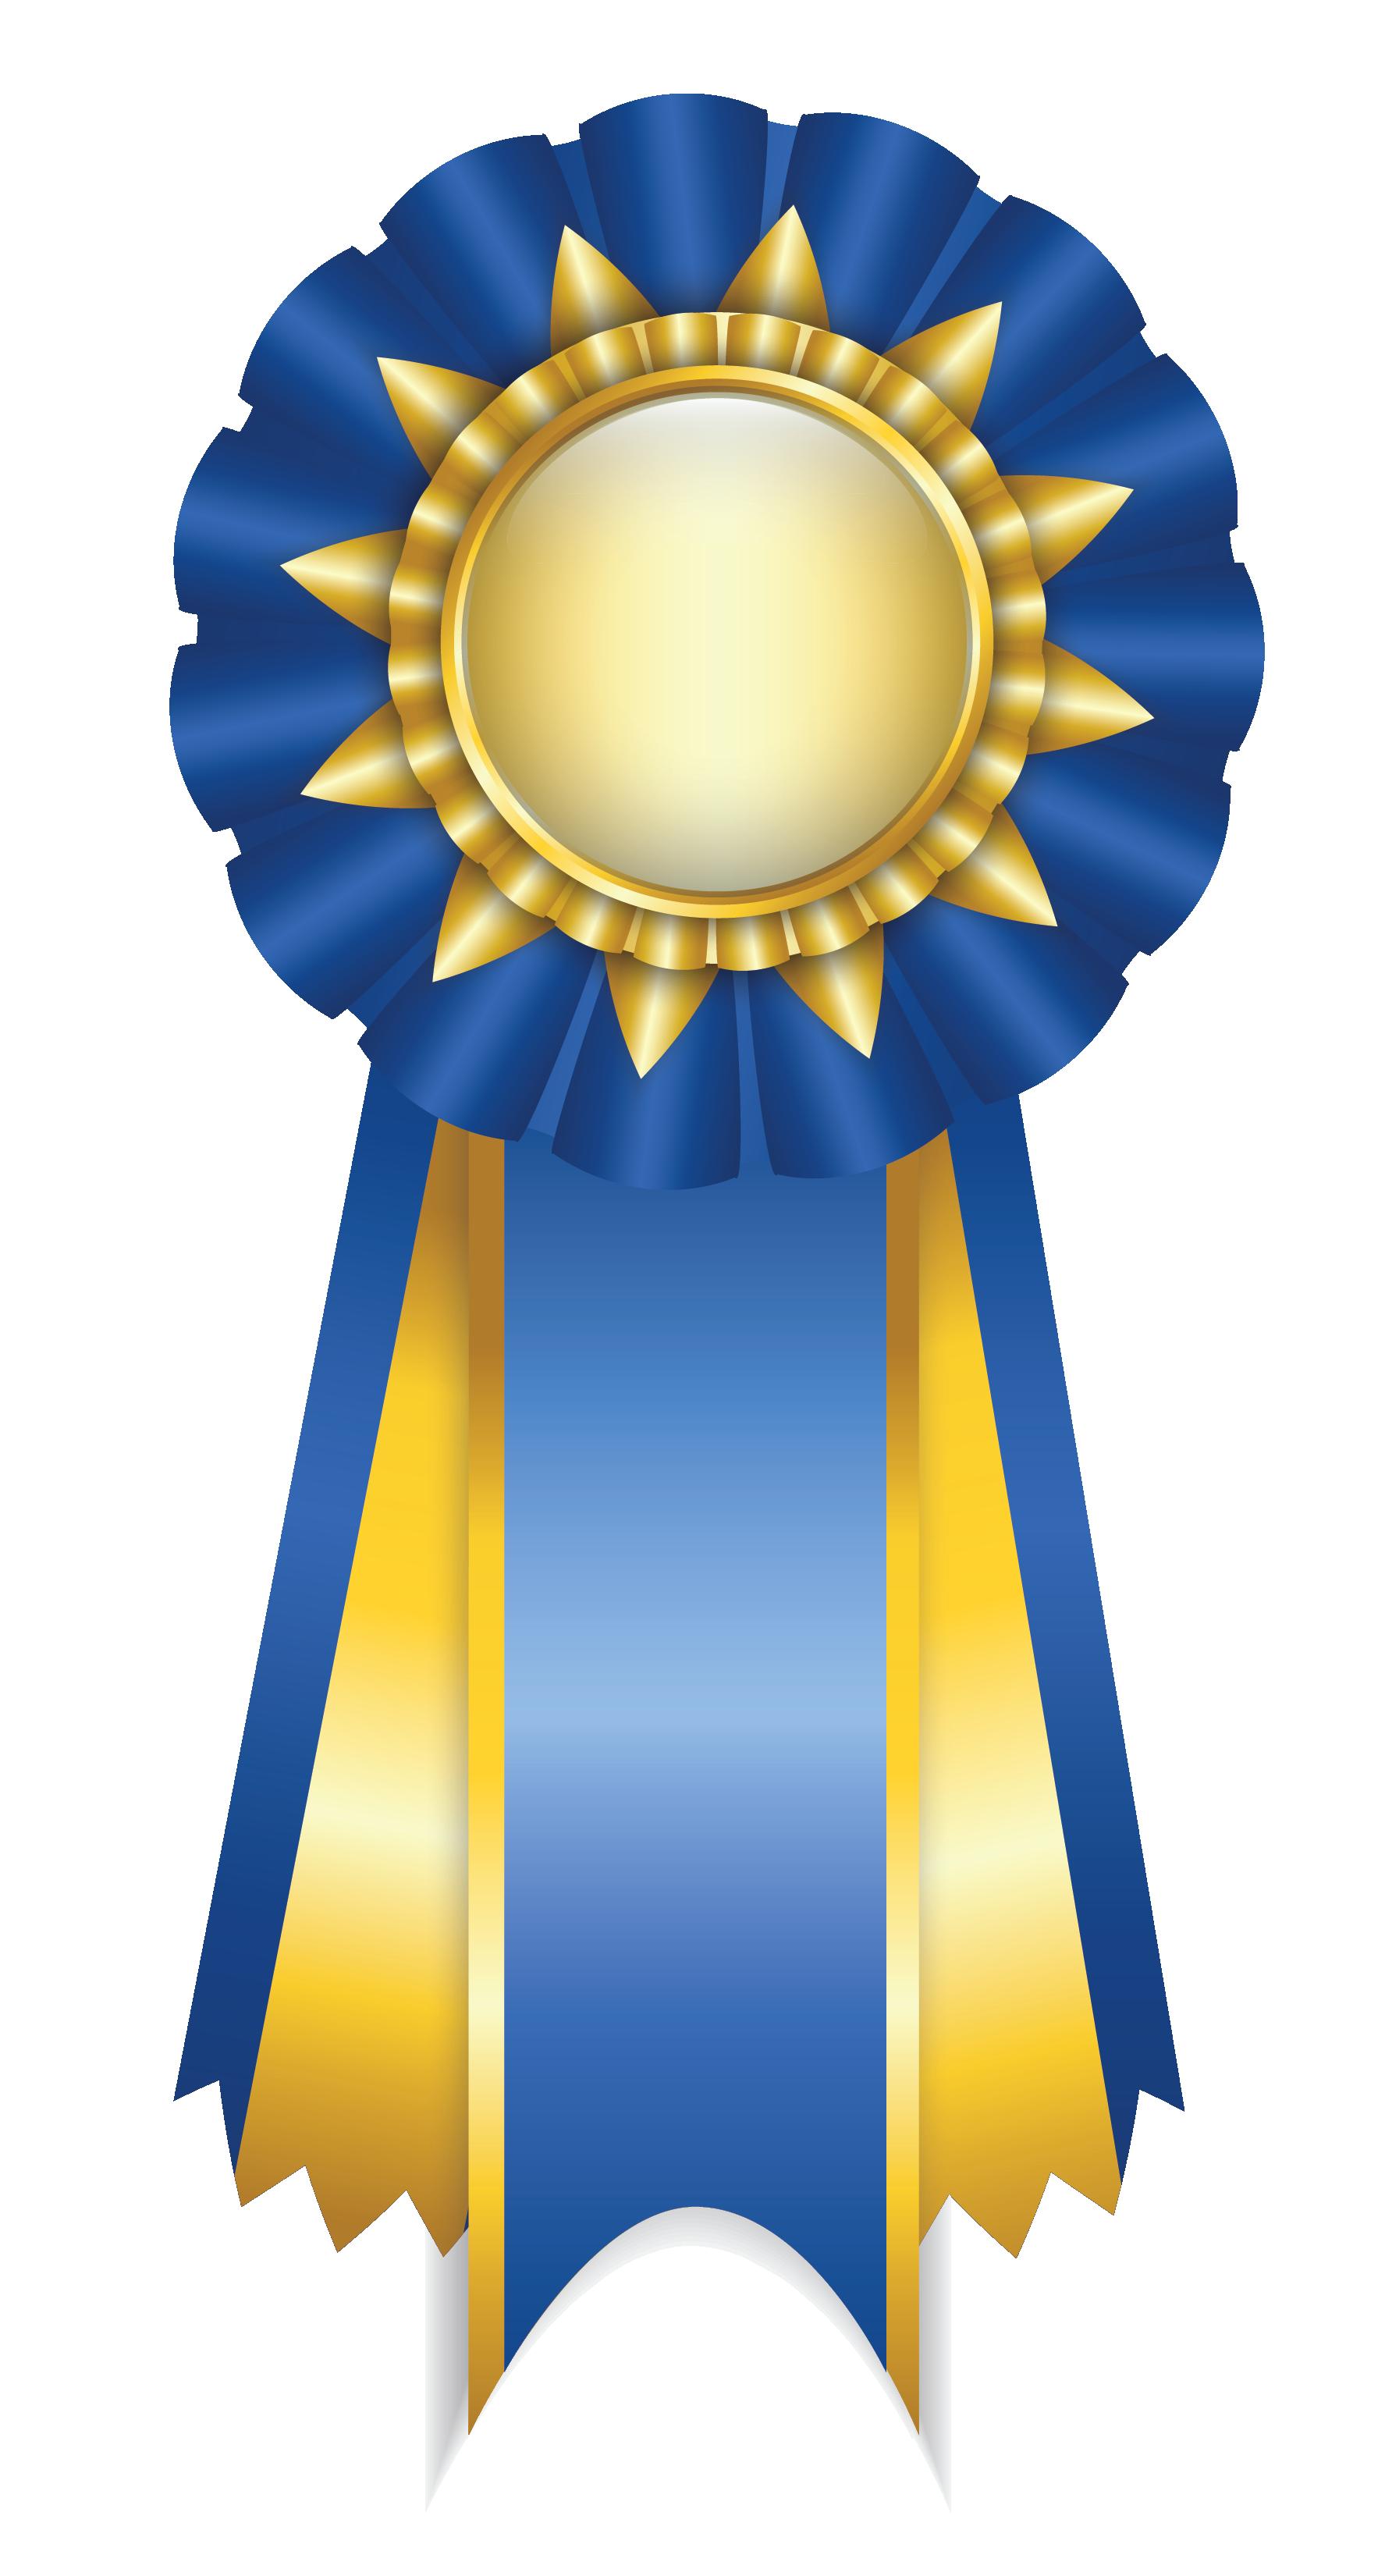 Award Ribbon Clipart - .-Award Ribbon Clipart - .-4